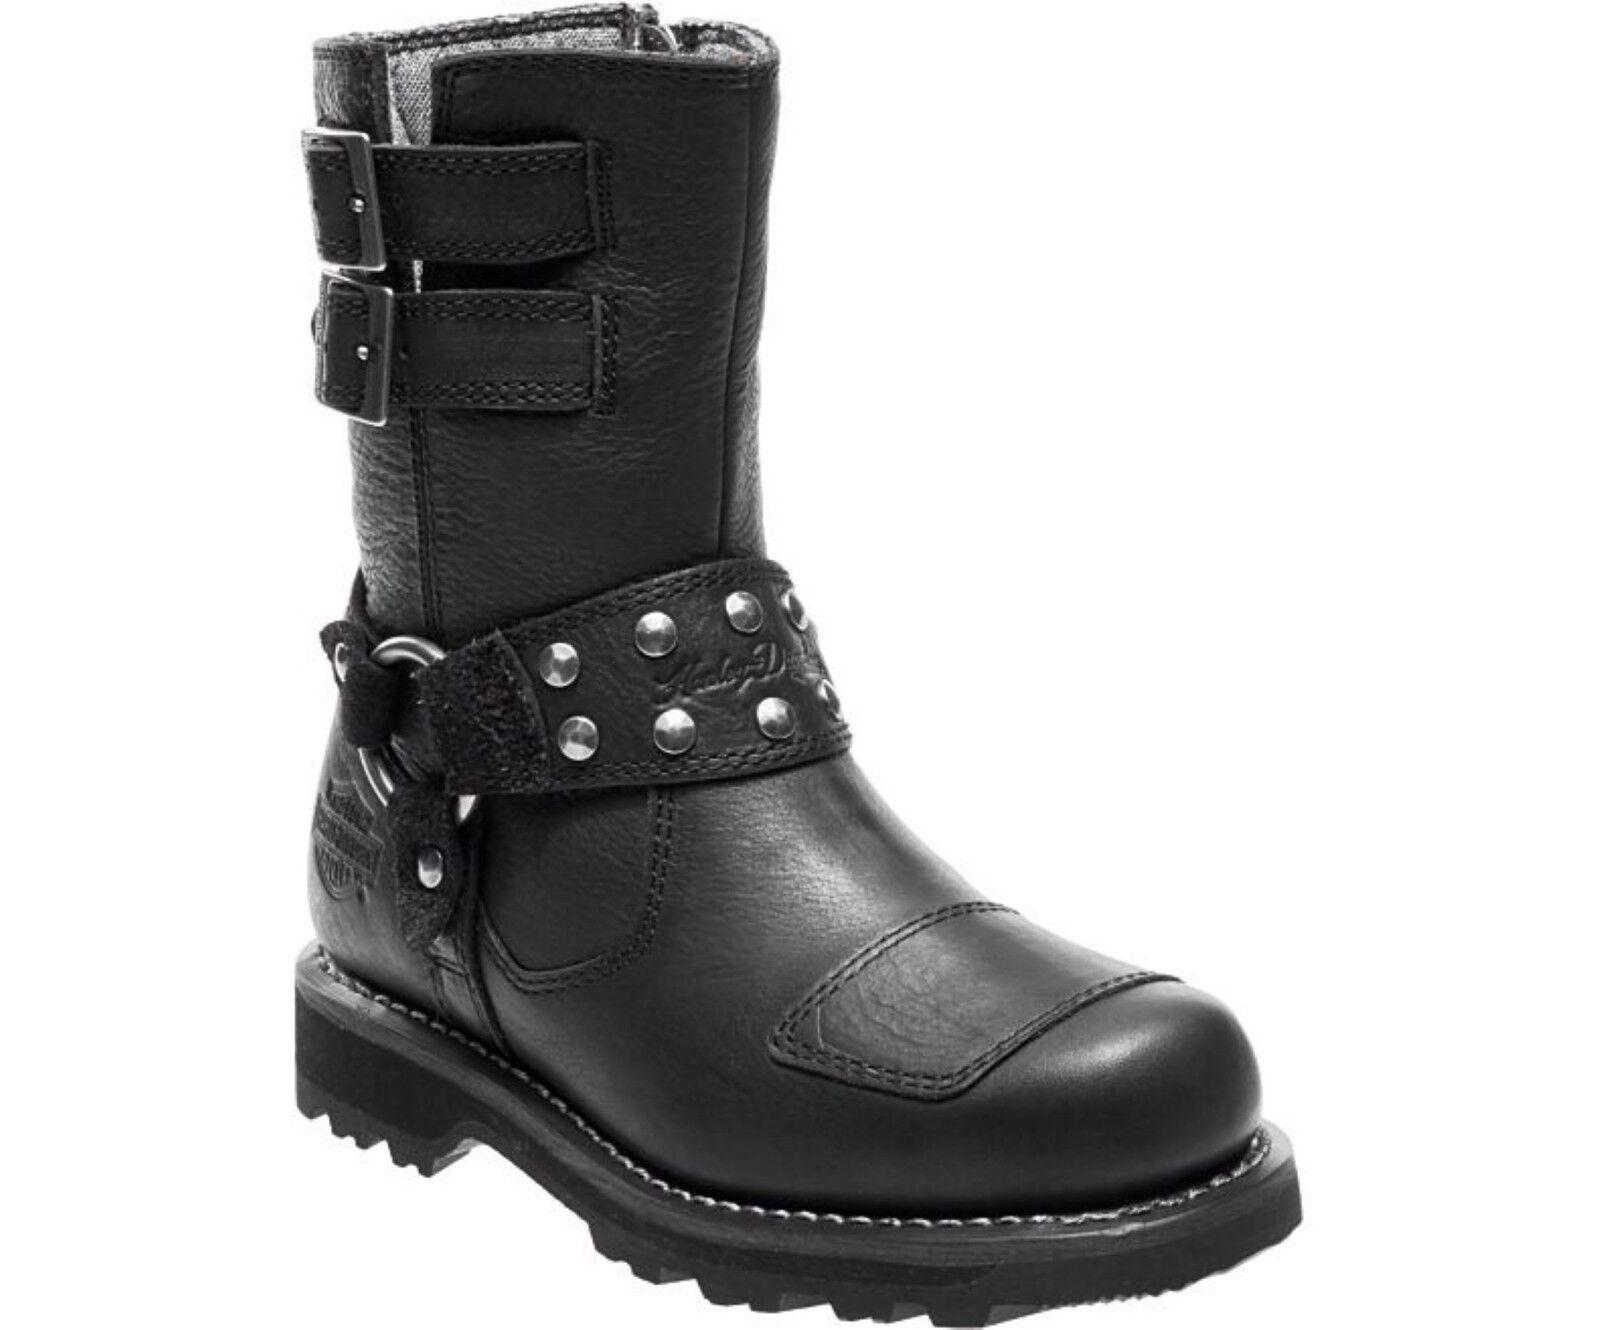 Harley Davidson Marmora Ladies Mid Calf Black Leather Biker Boots Buckle Zip Up